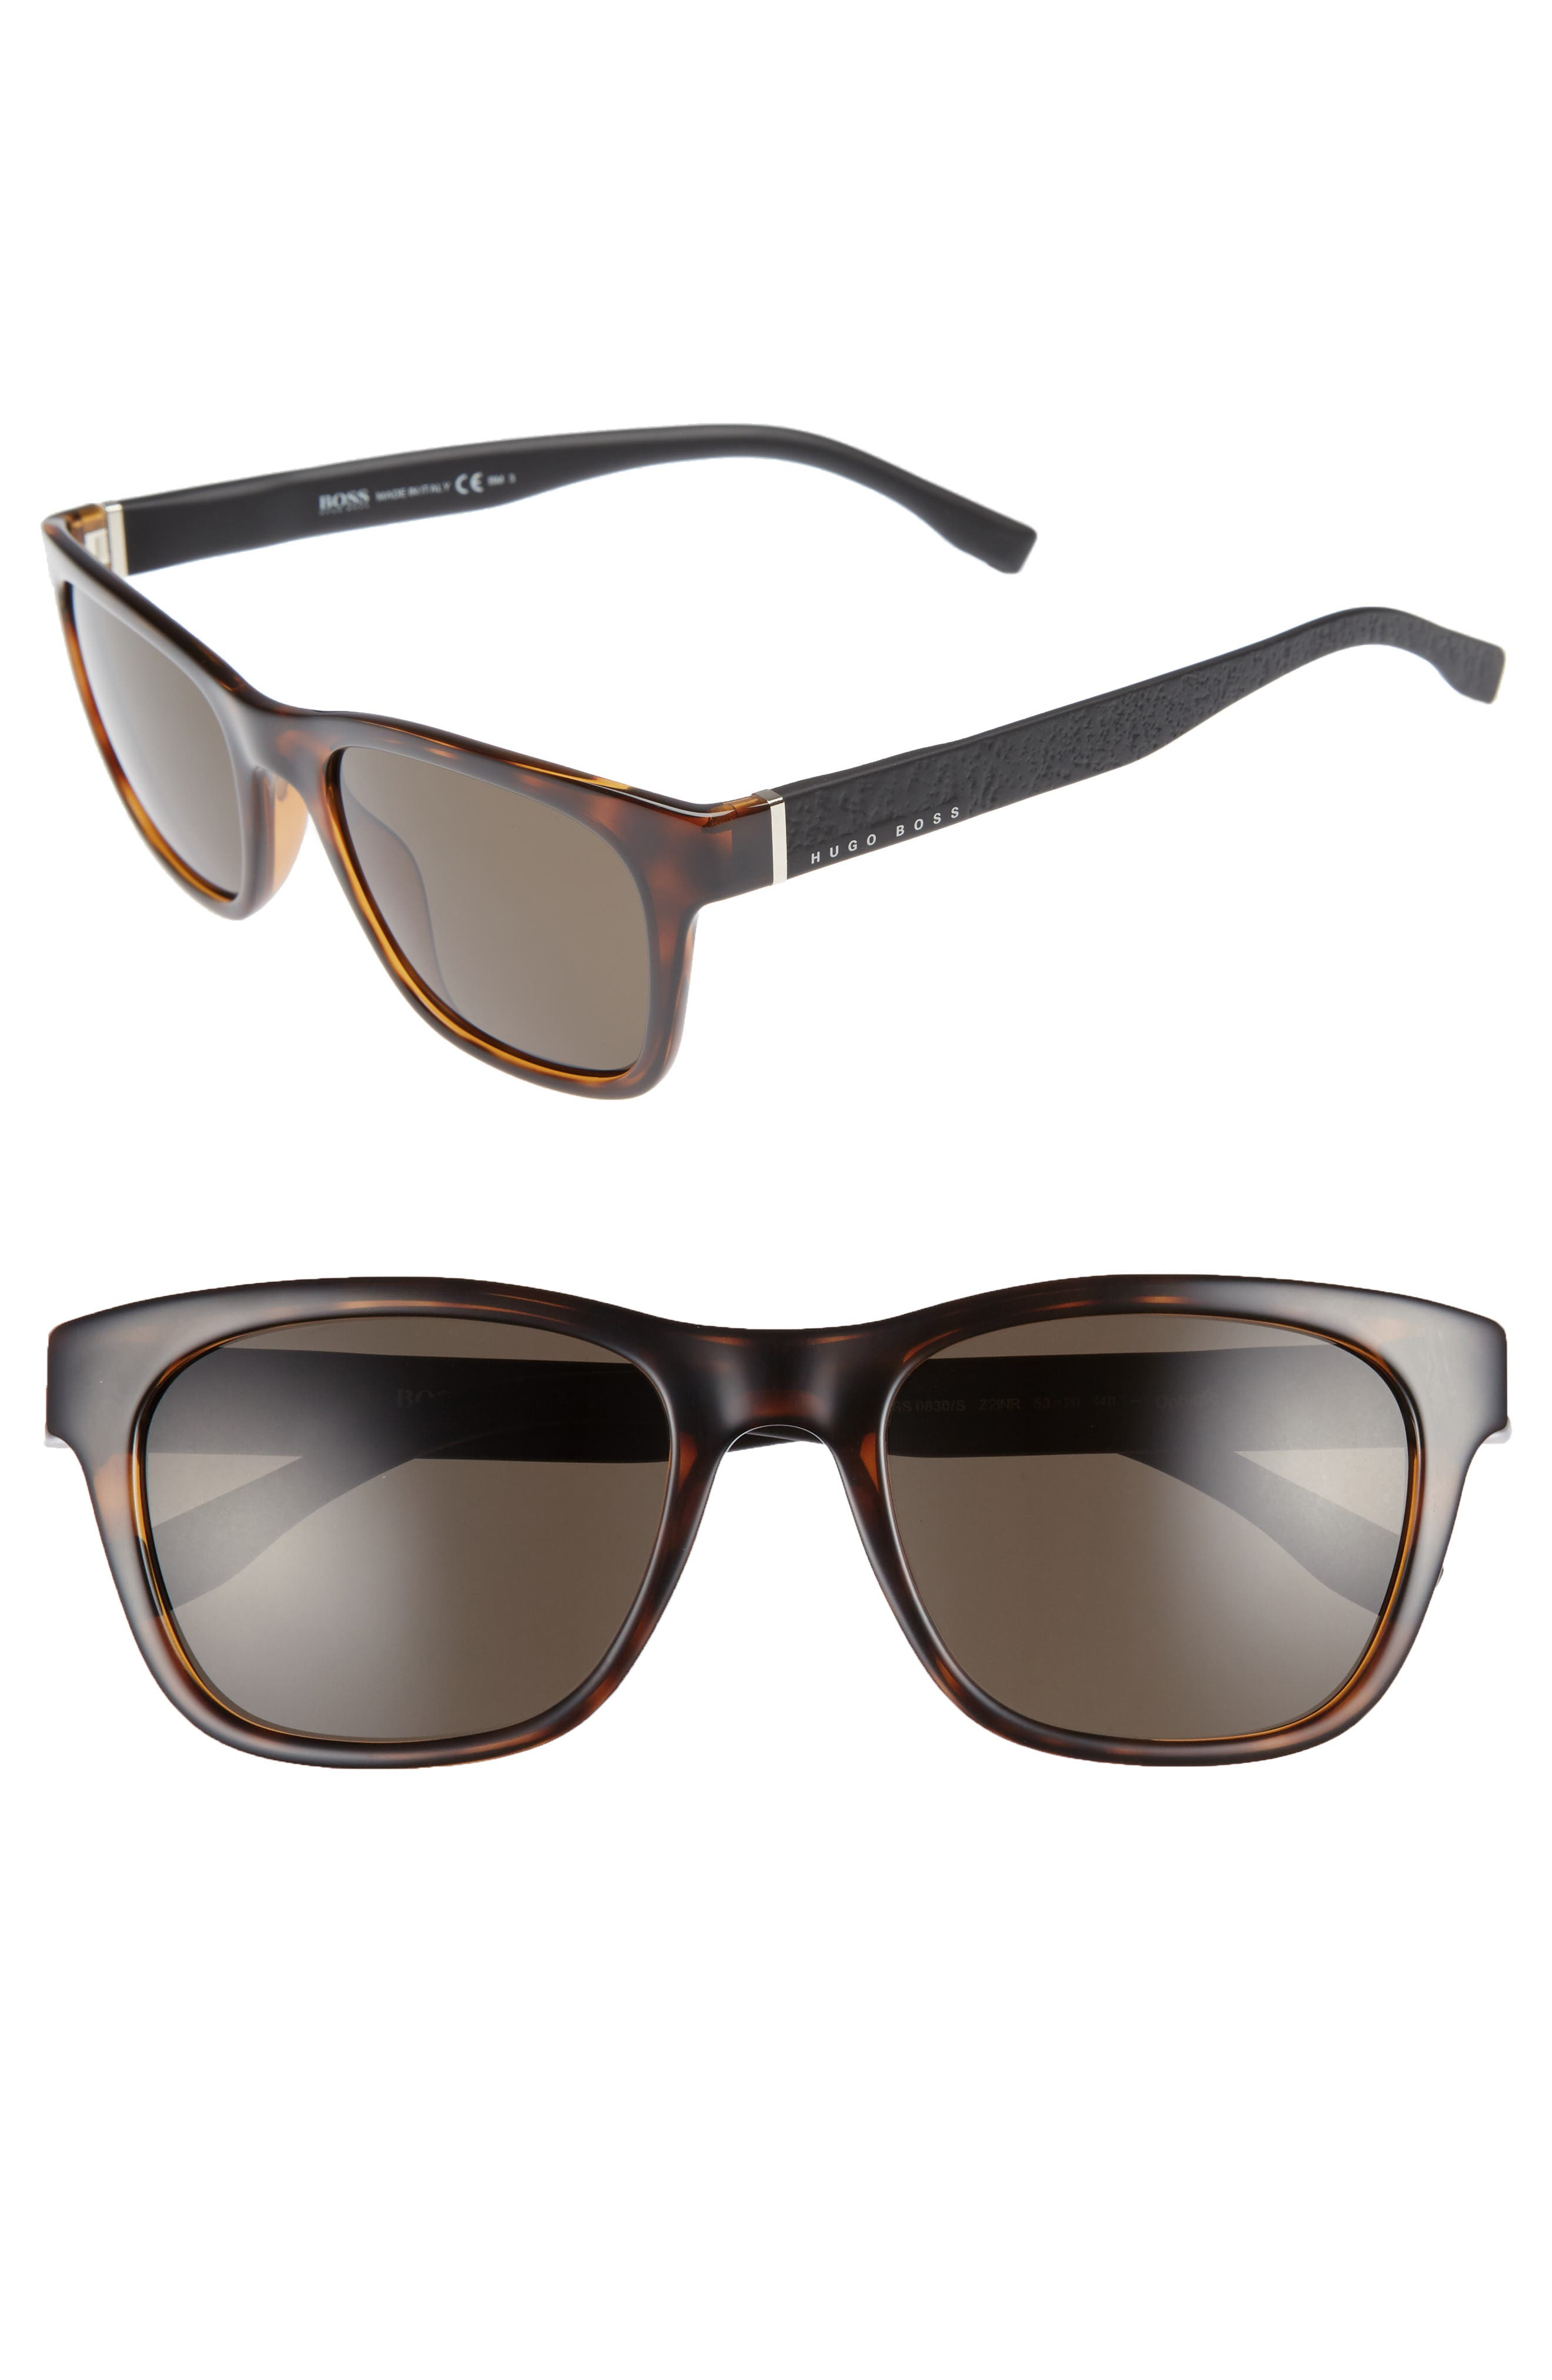 Main Image - BOSS 53mm Polarized Sunglasses